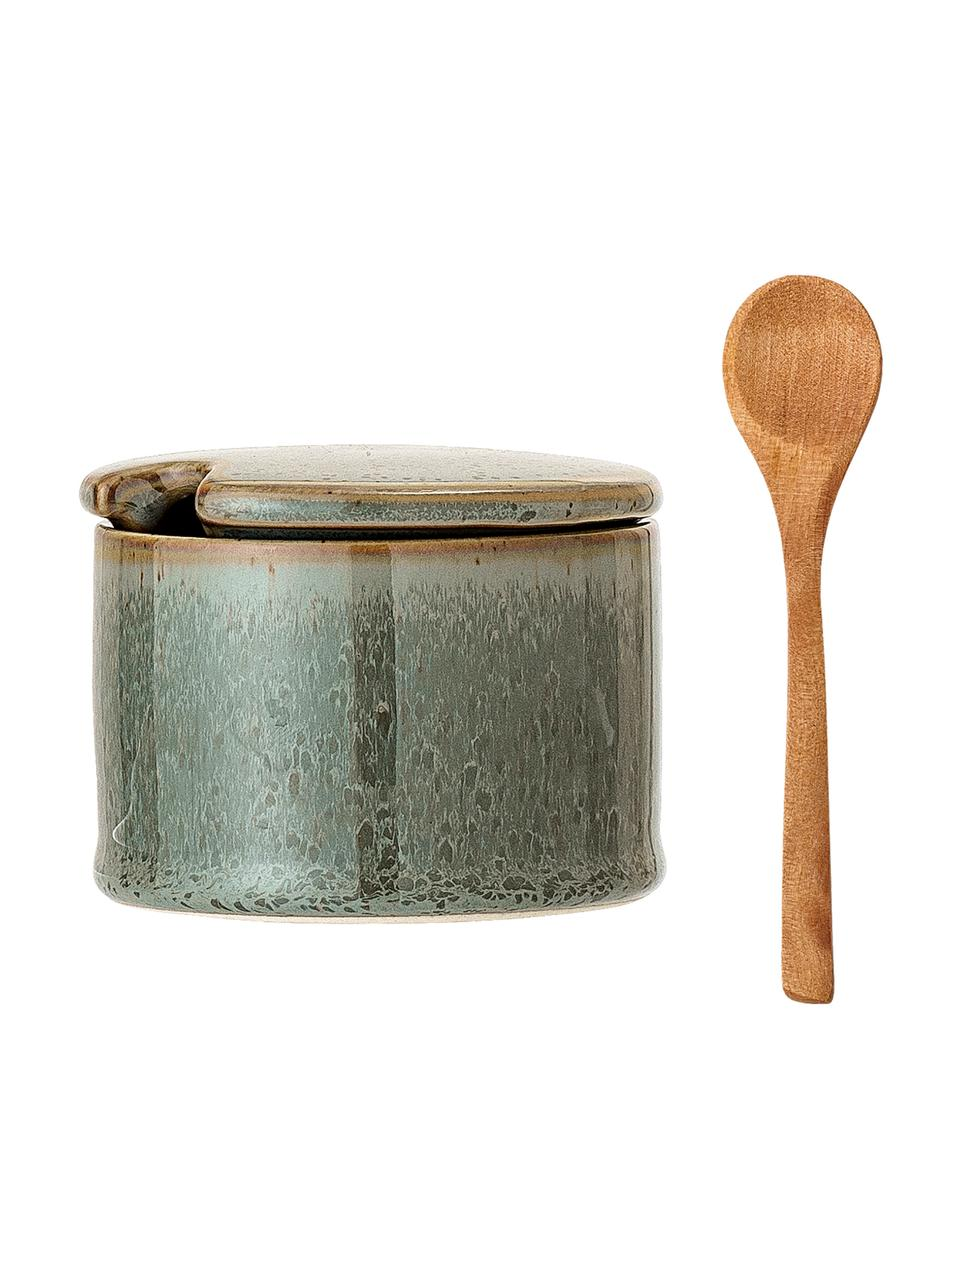 Zuccheriera in terracotta con cucchiaio di legno Pixie, Contenitore: gres, Cucchiaio: legno d'acacia, Tonalità verdi, Ø 8 x Alt. 6 cm